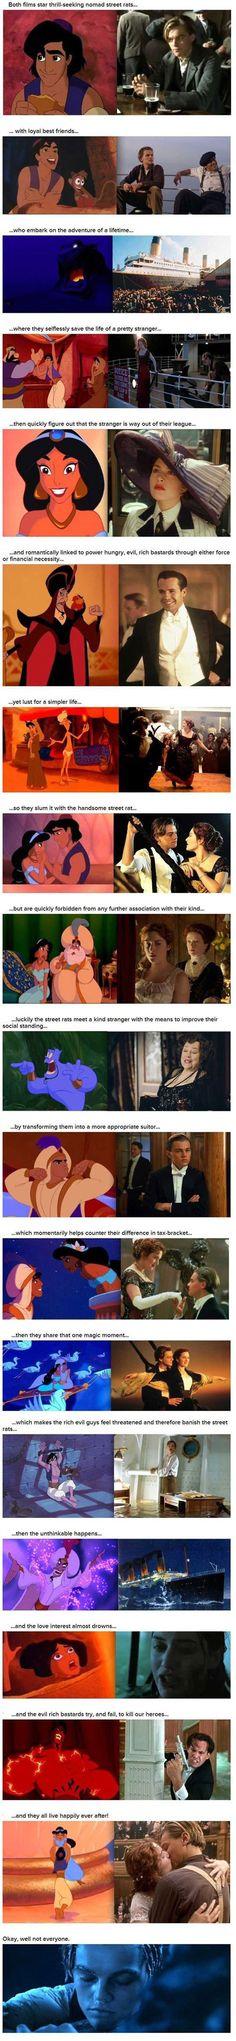 Disney Aladdin Titanic Leonardo Dicaprio Kate Winslet.